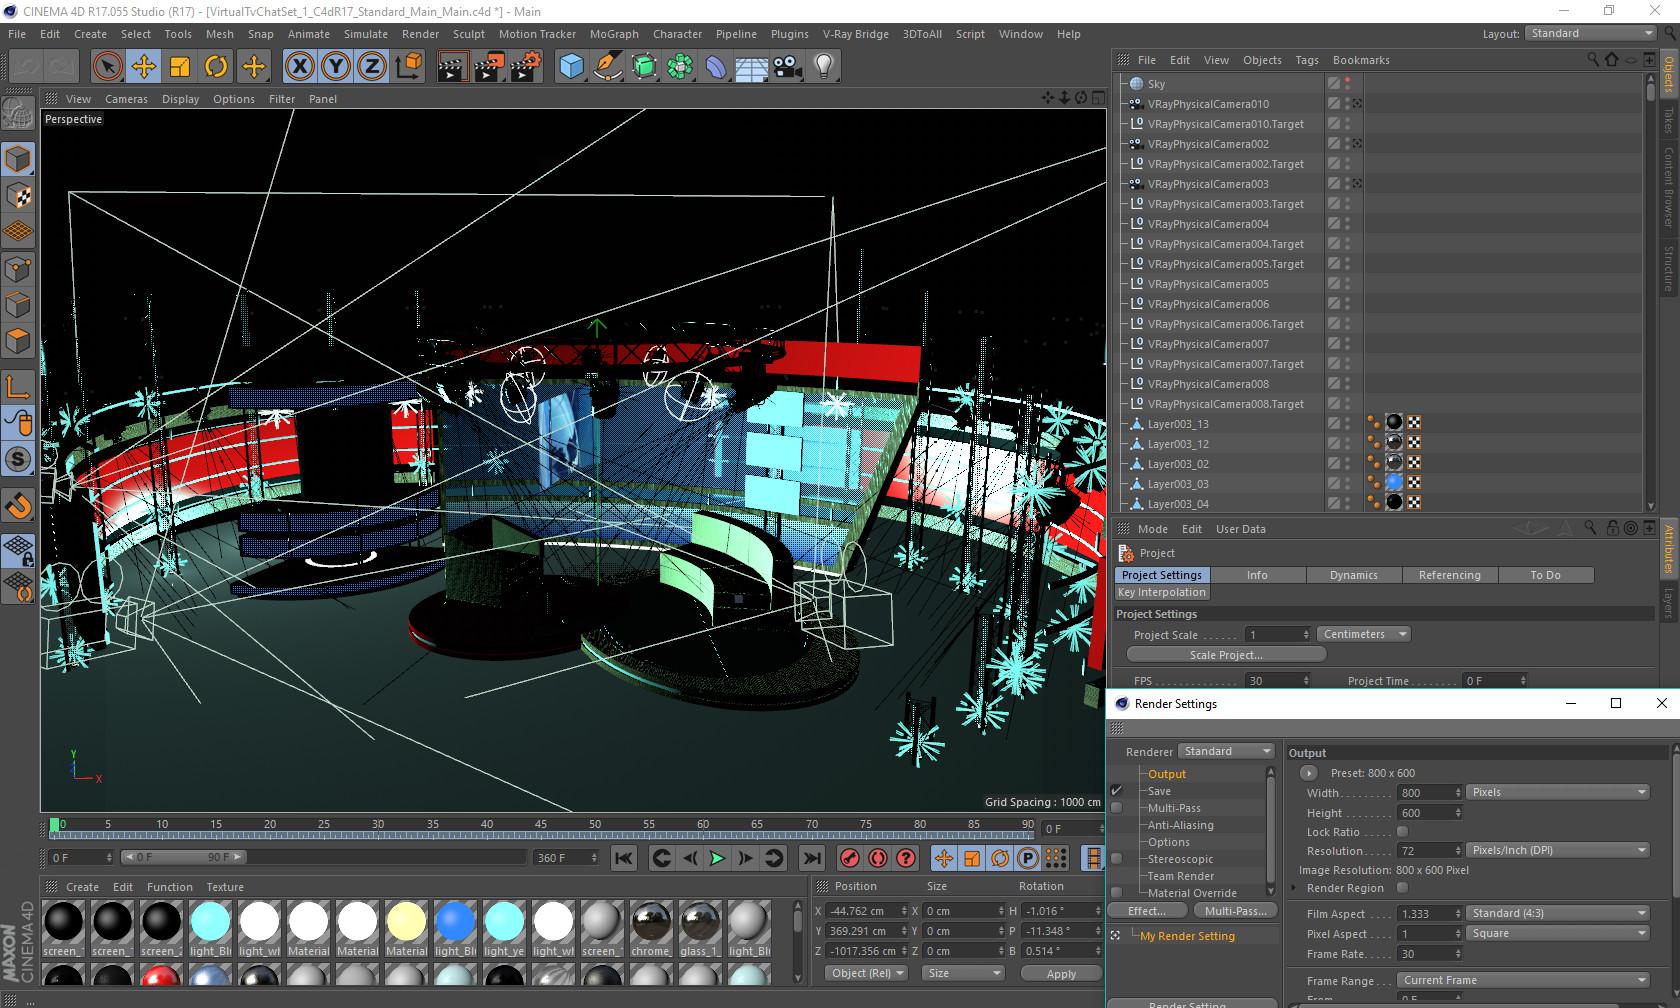 ArtStation - 3D Virtual TV Studio Chat Set 1, aker Studio